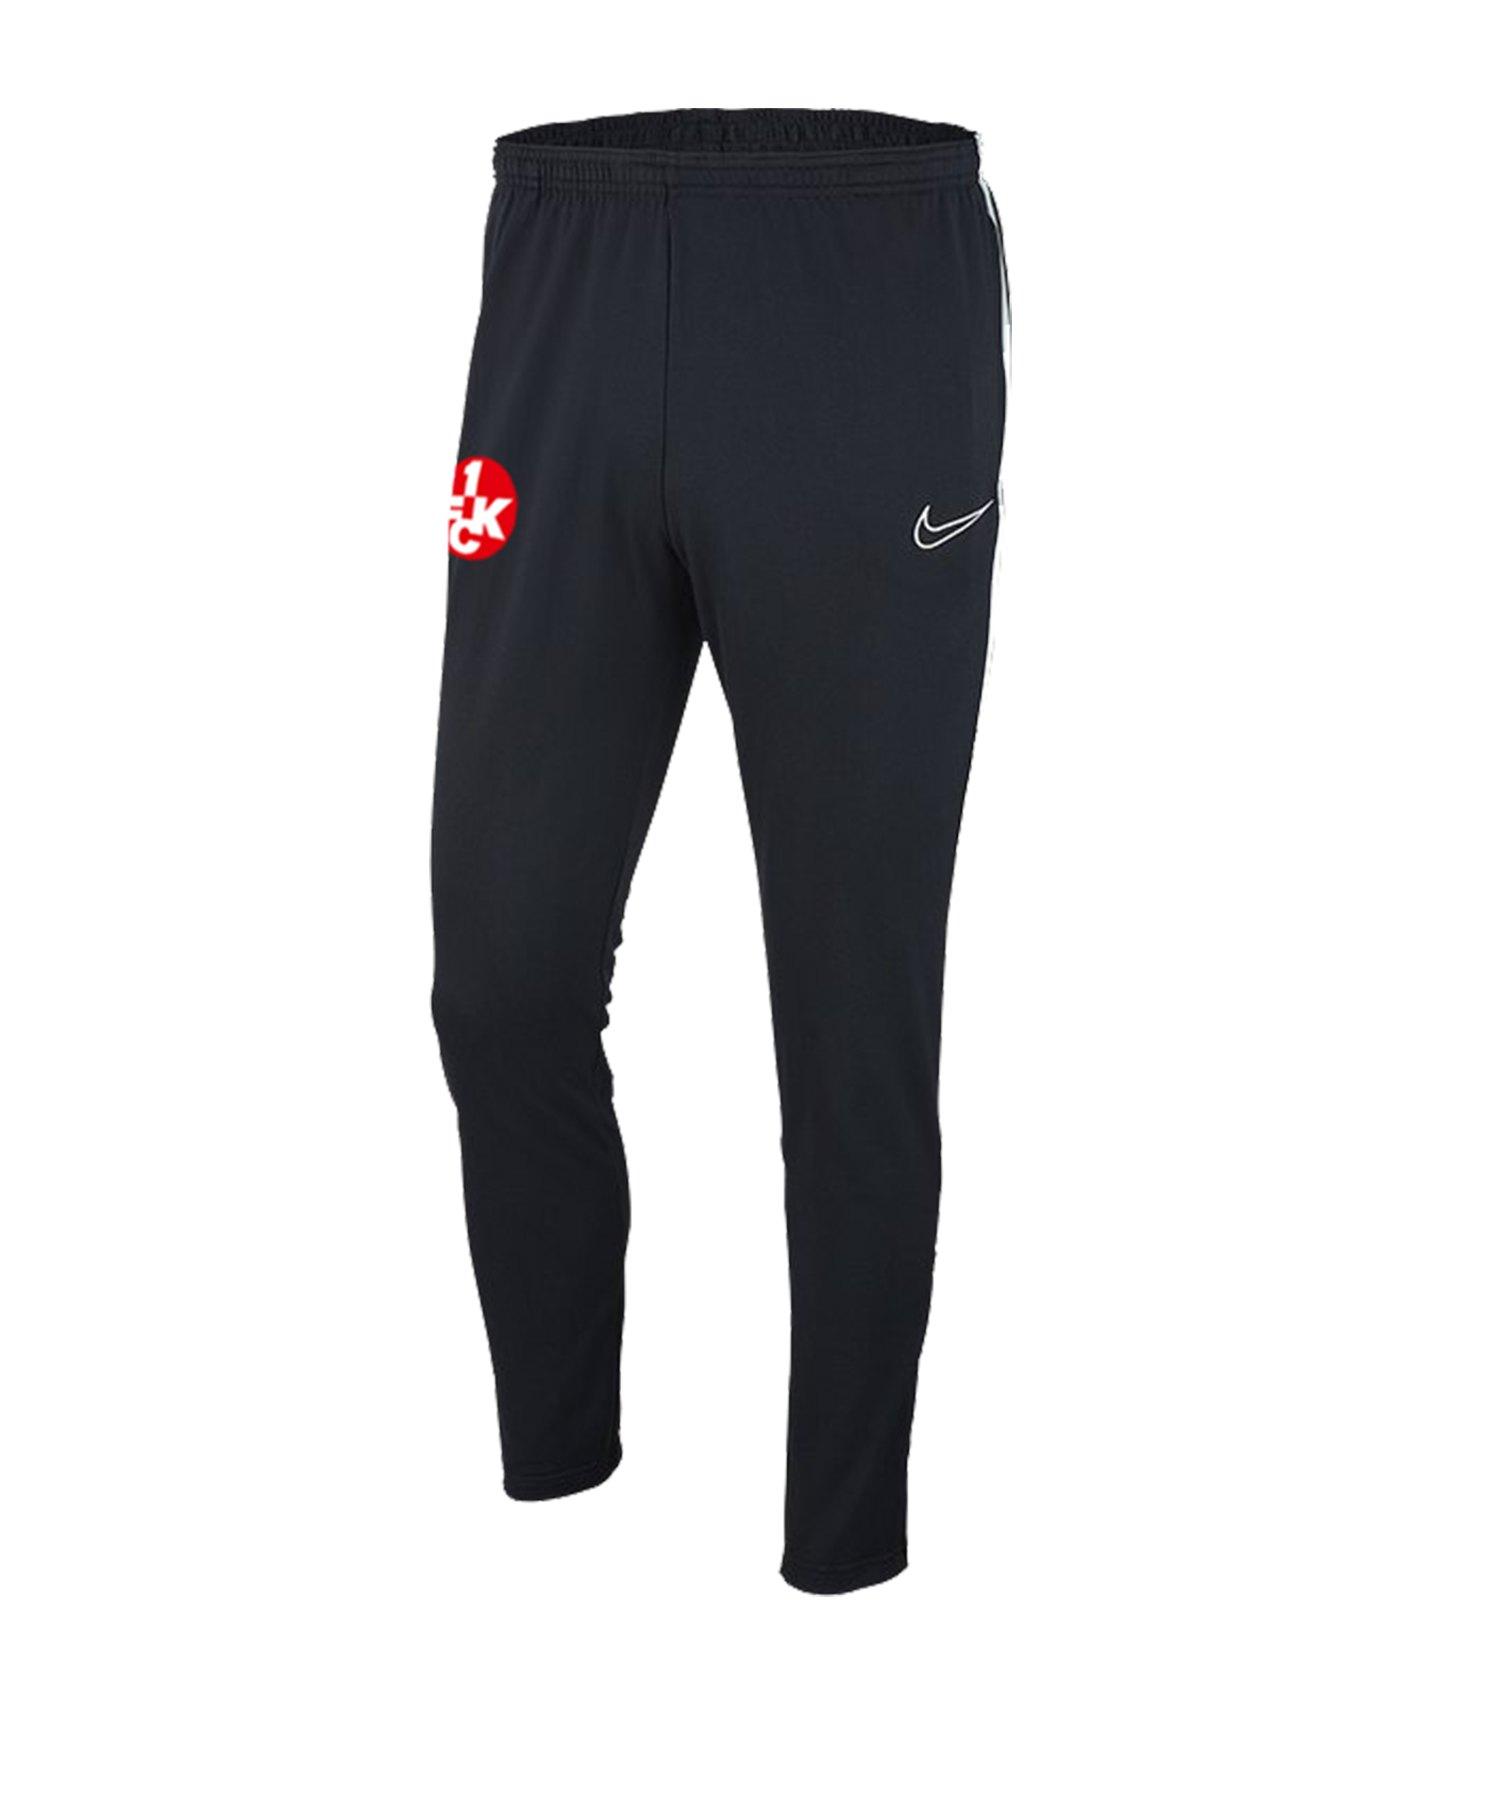 Nike 1. FC Kaiserslautern Trainingshose Kids F010 - schwarz